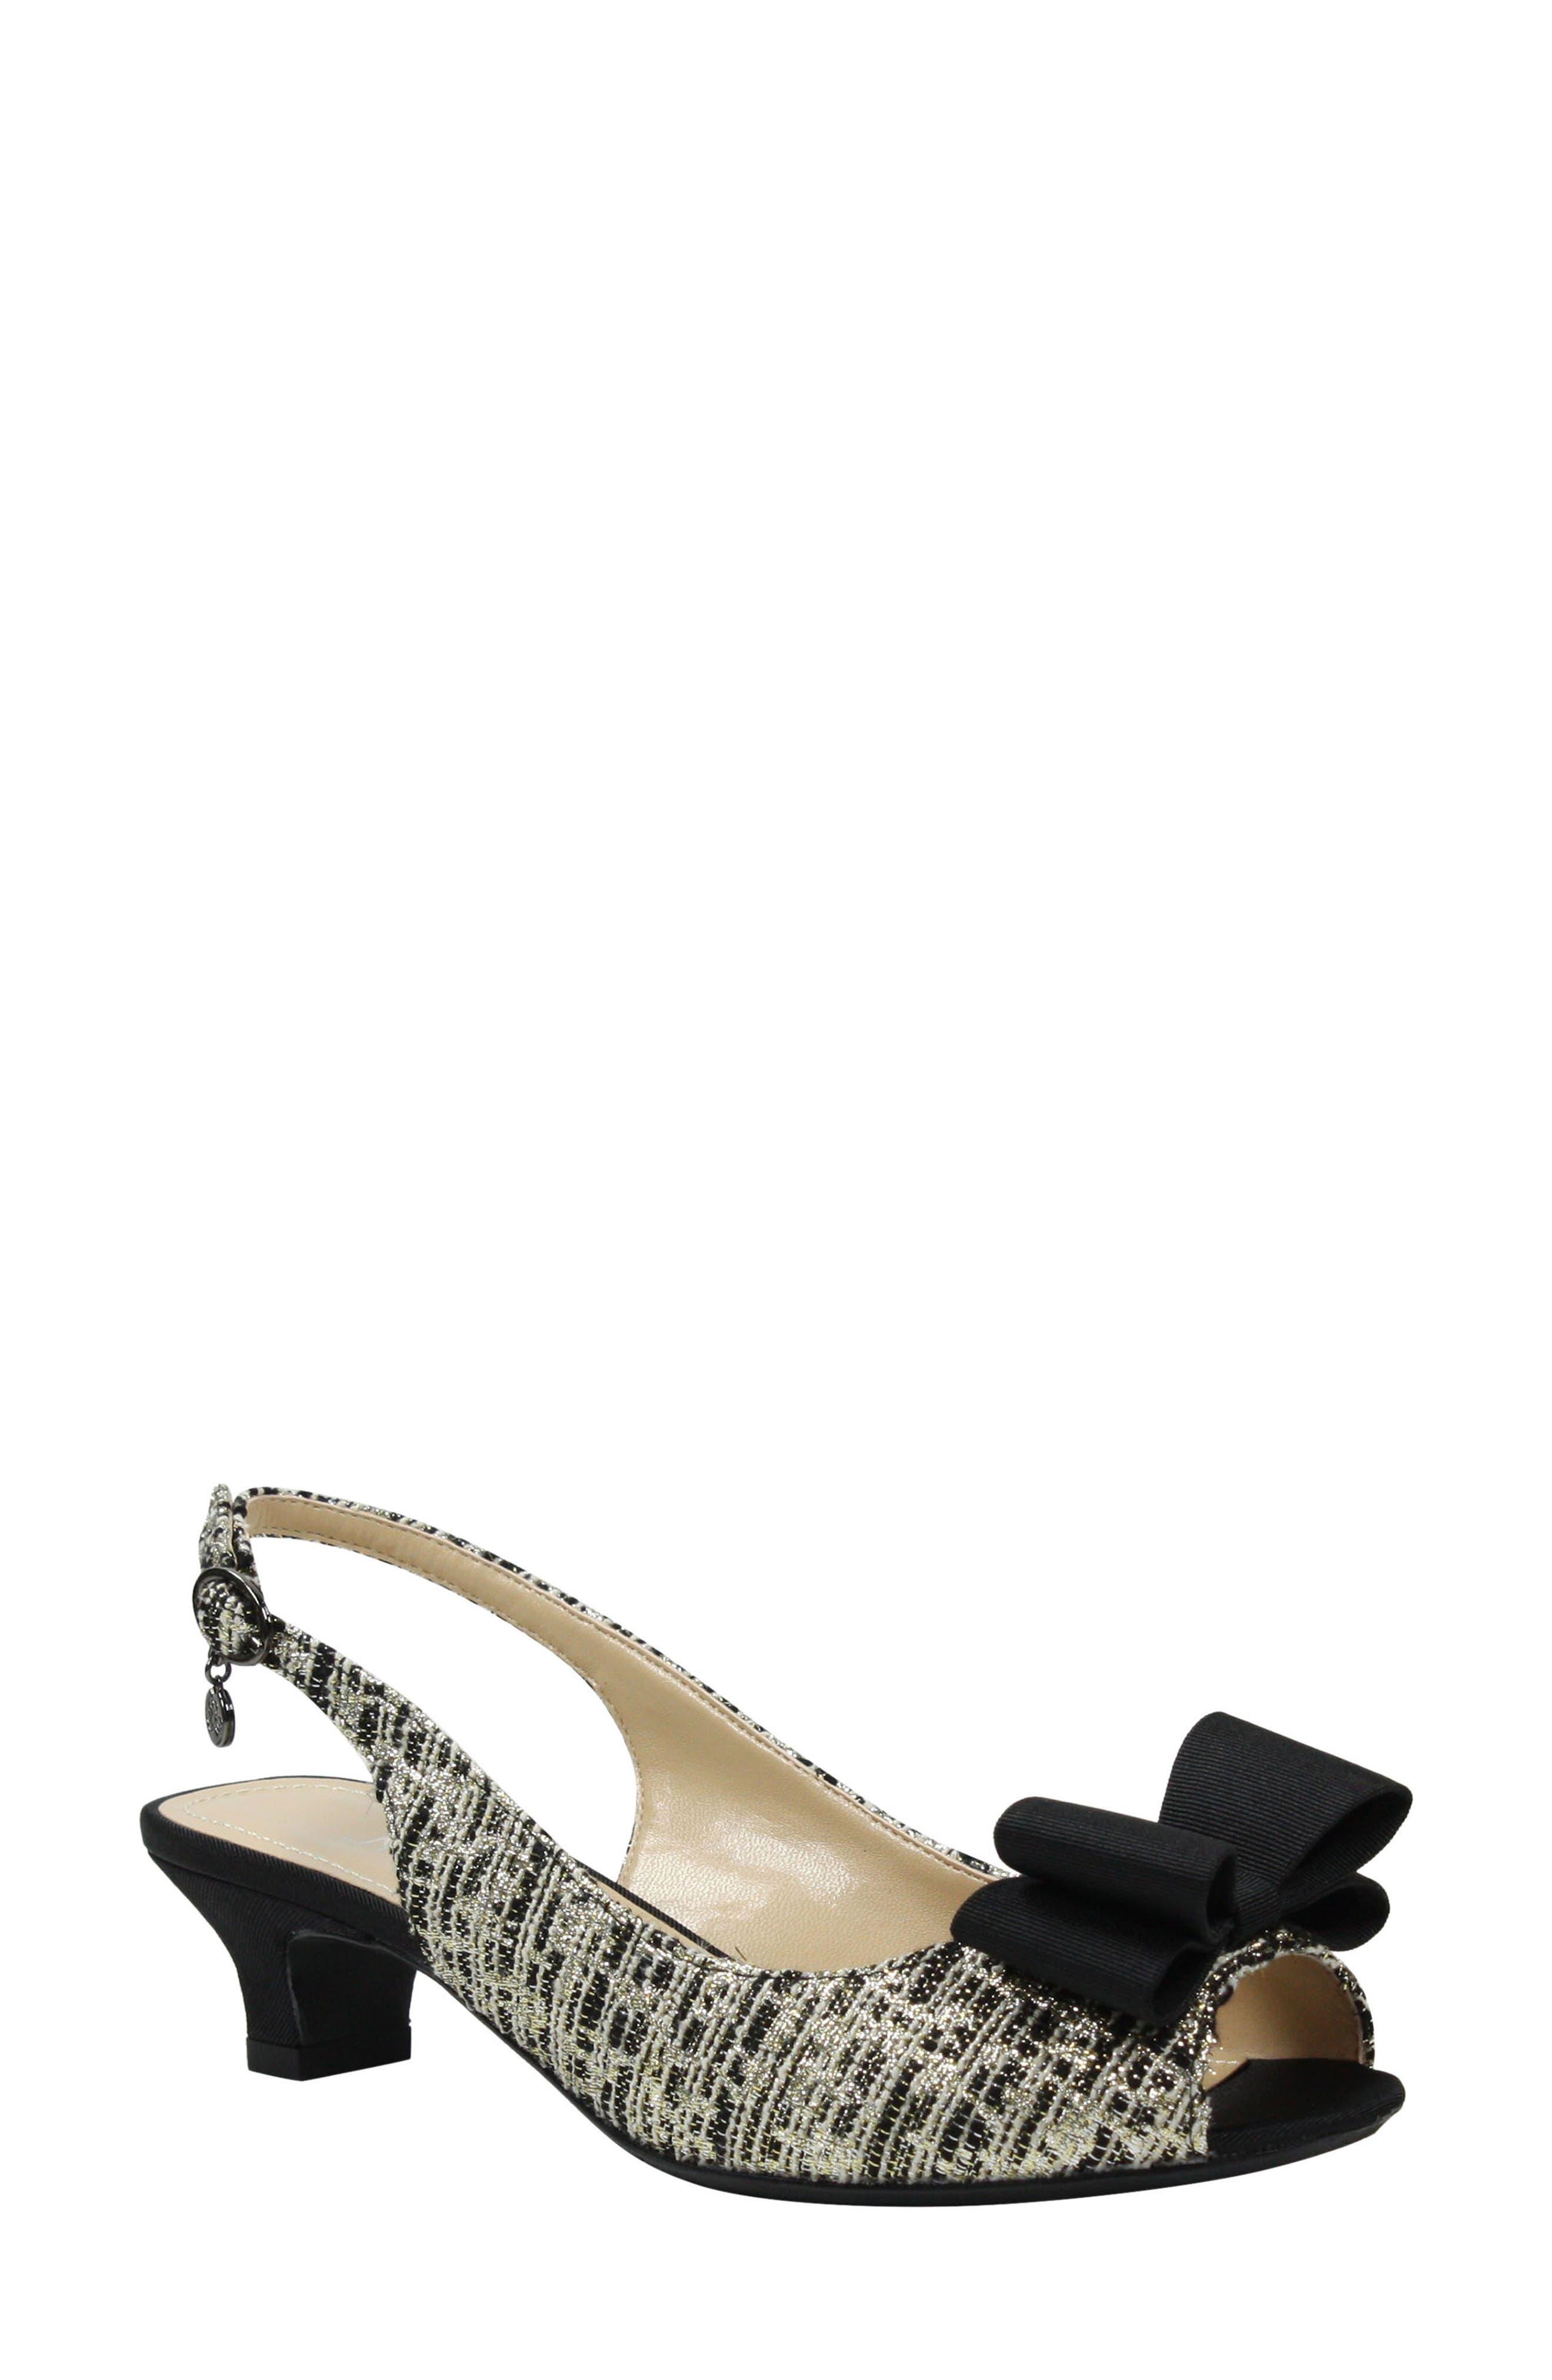 J. RENEÉ Landan Bow Slingback Sandal, Main, color, BLACK/ GOLD/ SILVER FABRIC